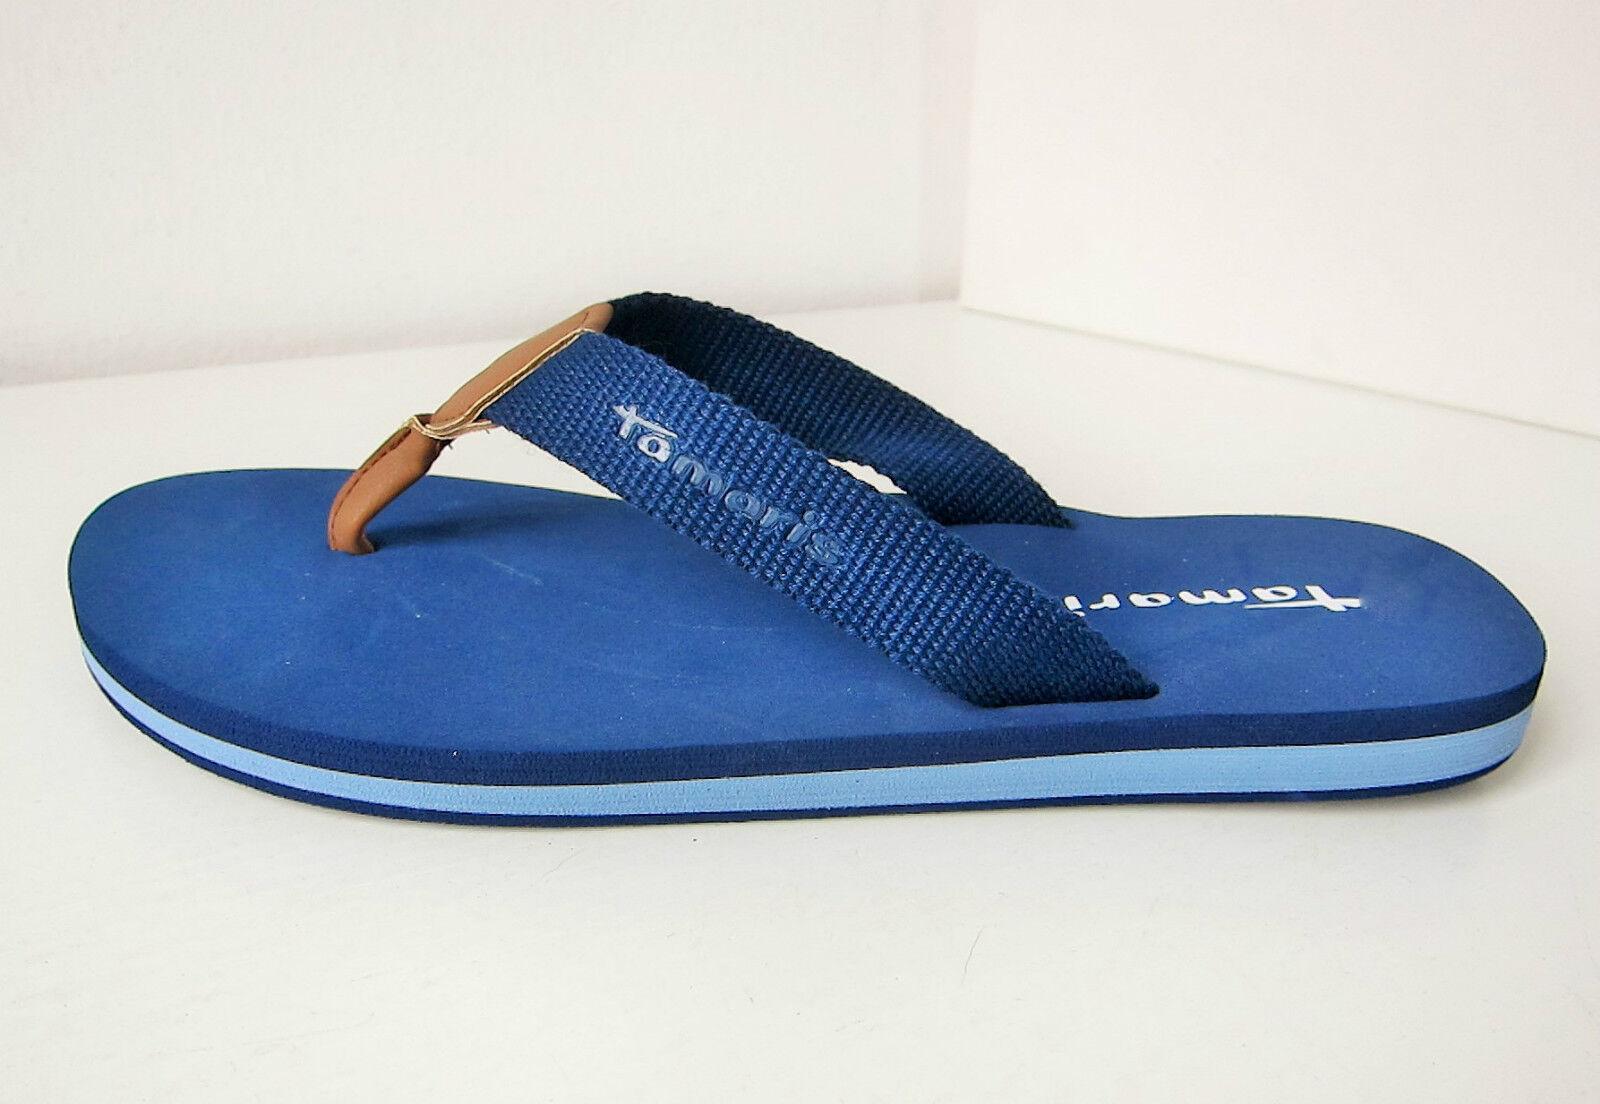 Tamaris Riemchen Sandale blau  Gr. navy 39 Zehentrenner thongs blue navy Gr. 447f15